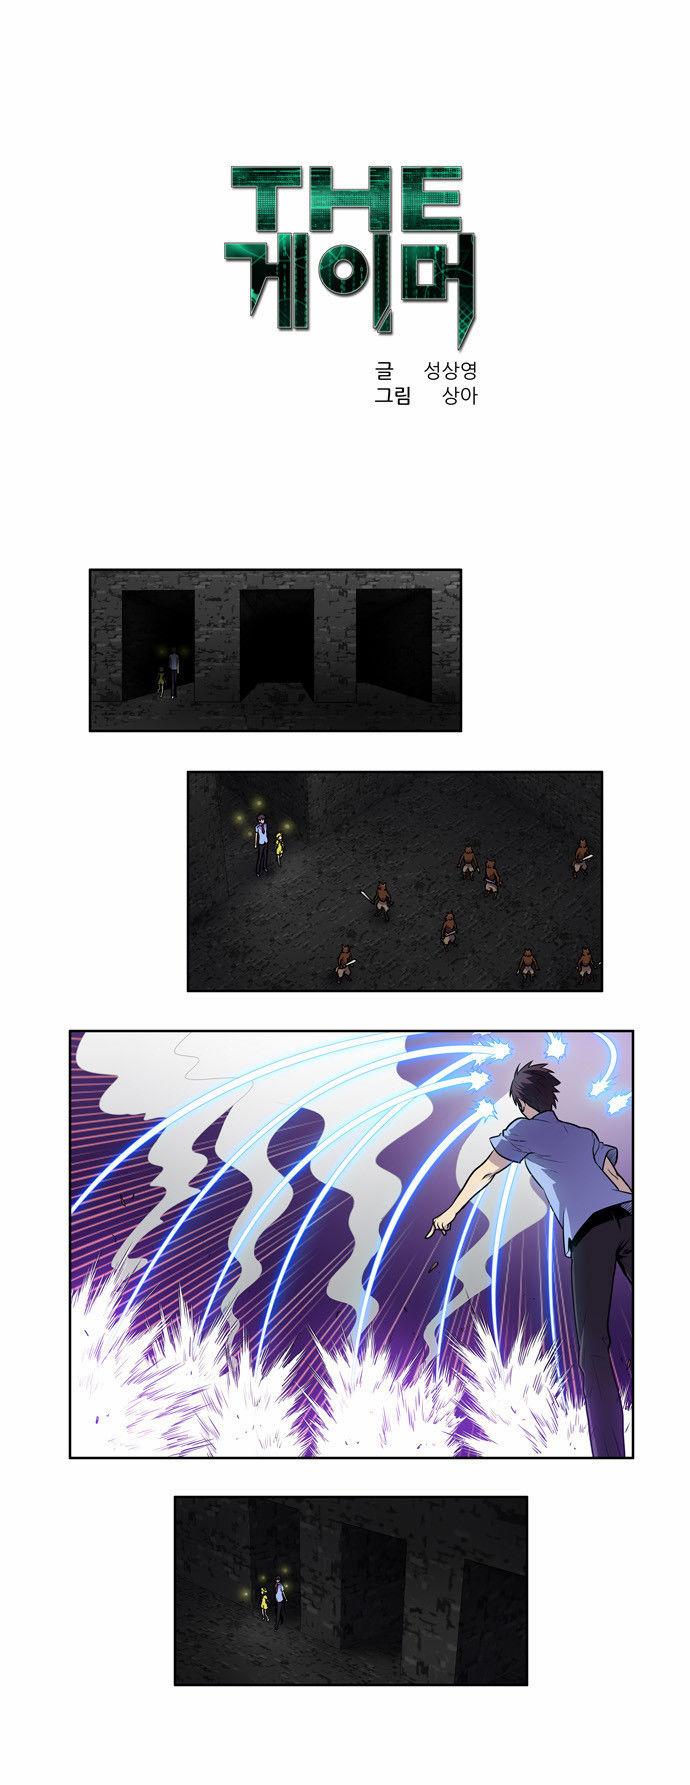 https://c5.ninemanga.com/es_manga/61/1725/396910/5bd4093601dc99da1b9c0f43d37f3441.jpg Page 1